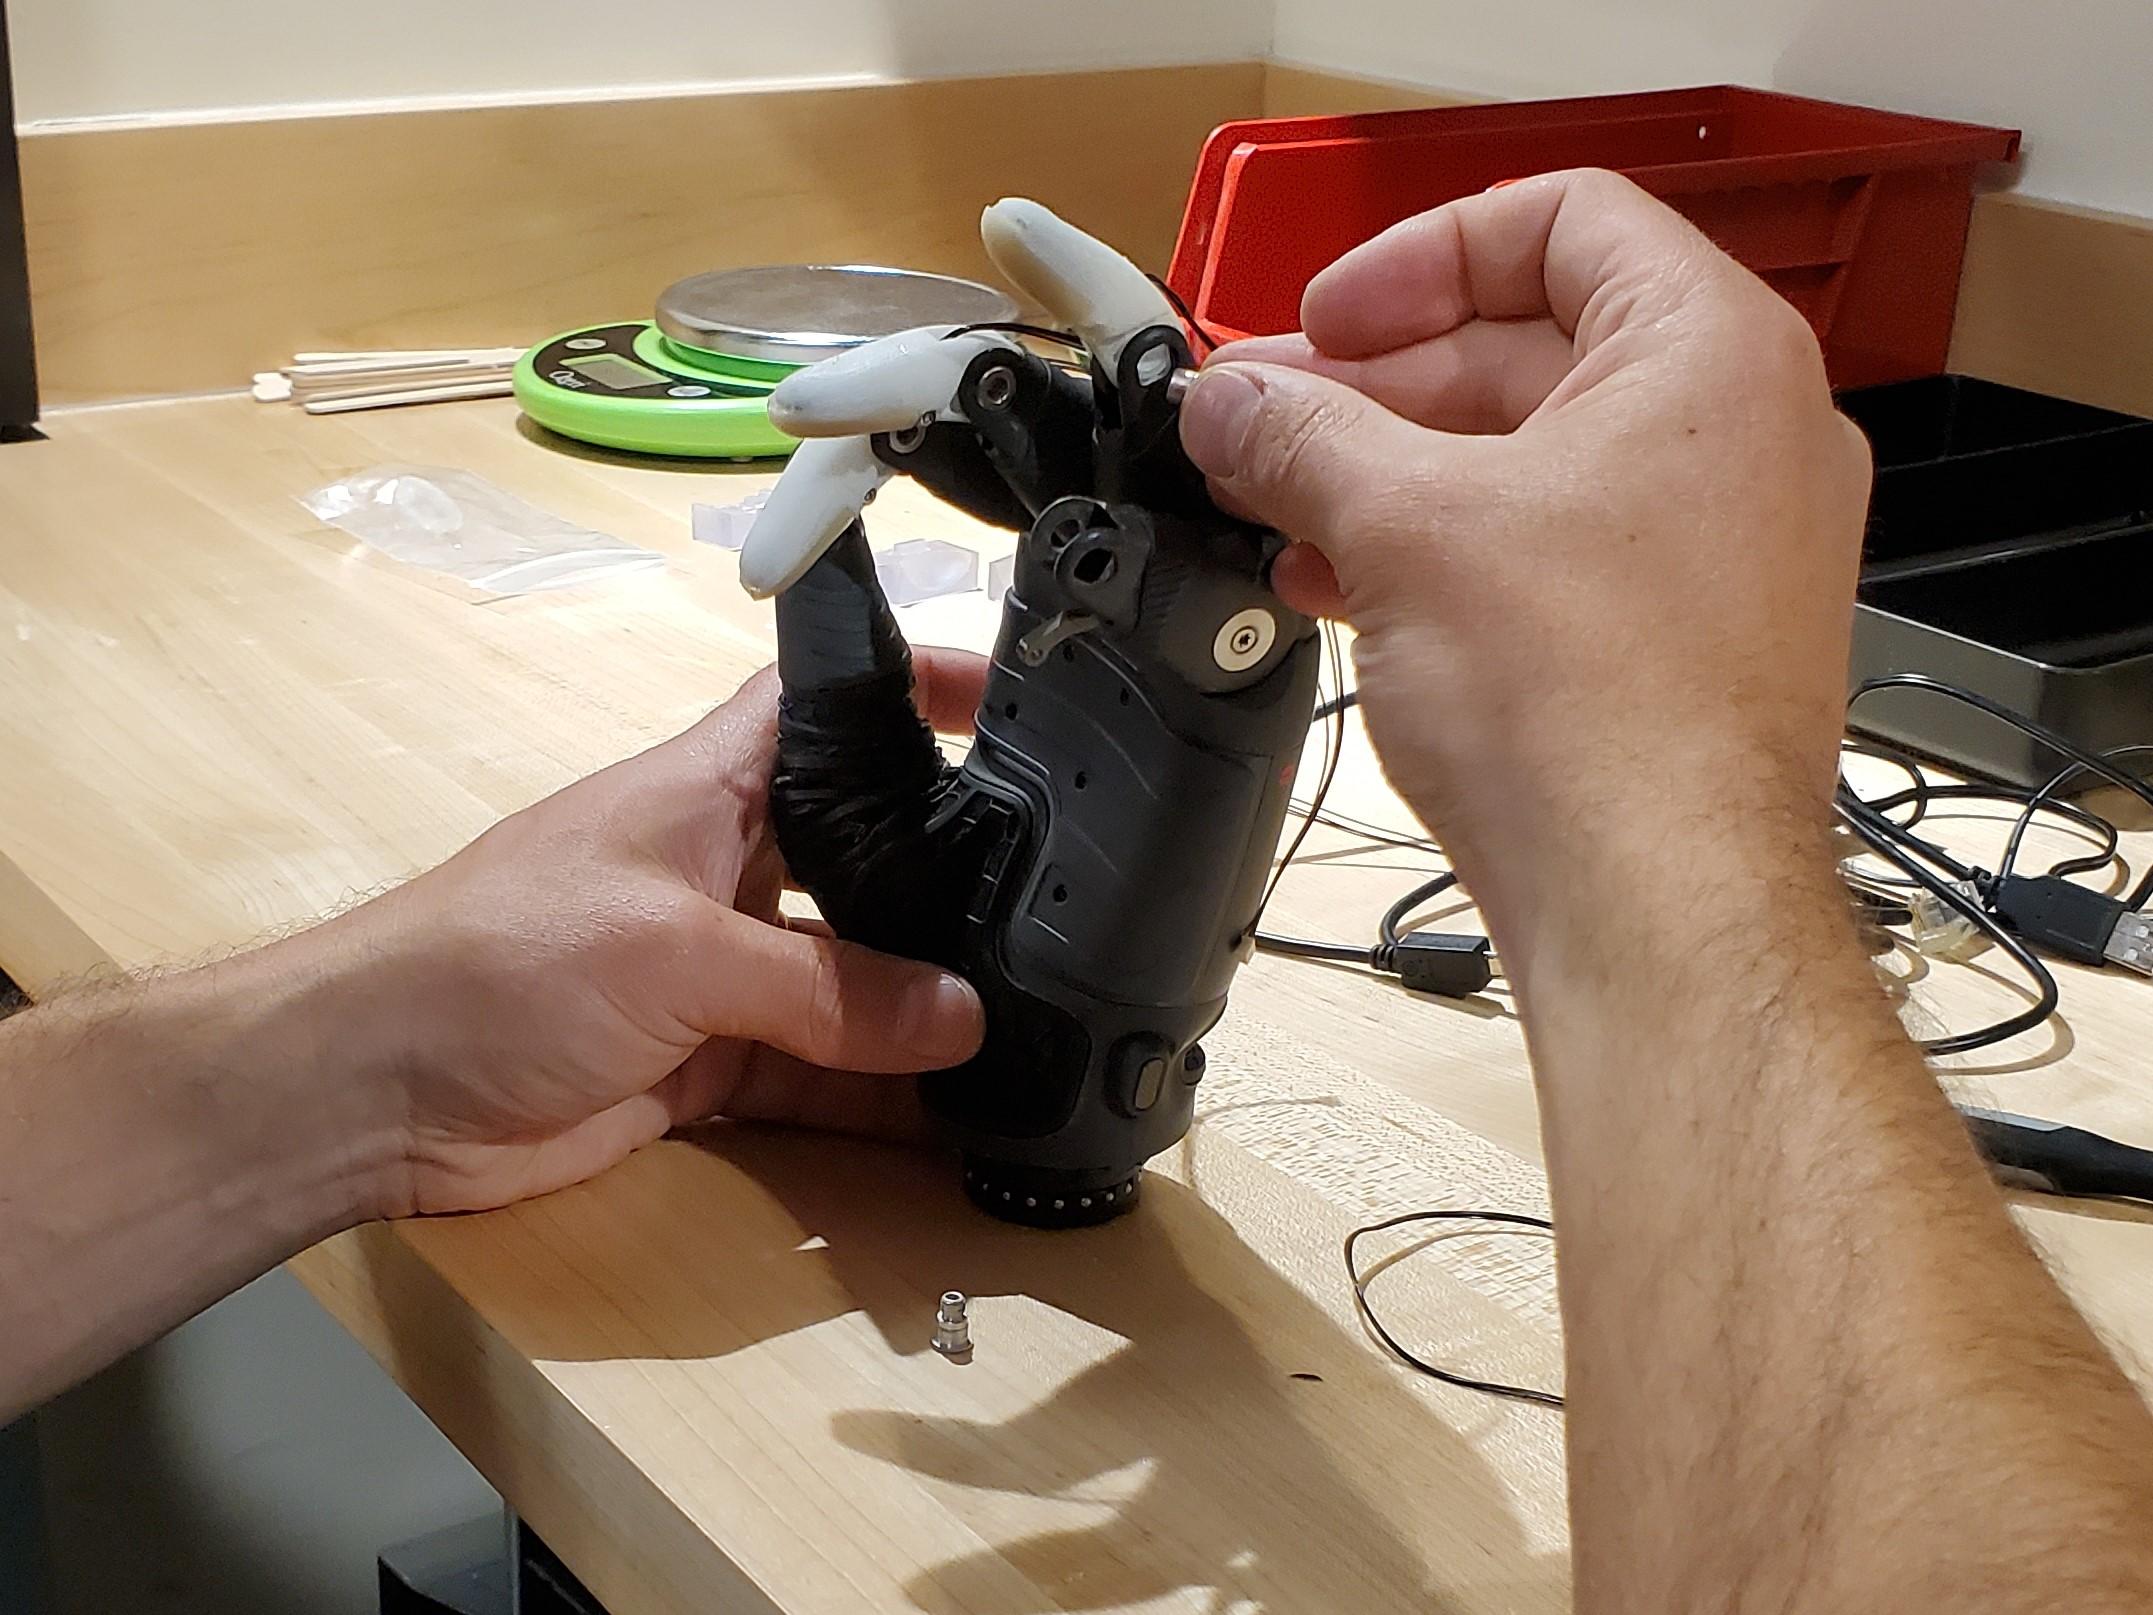 VA mechanical engineered hand